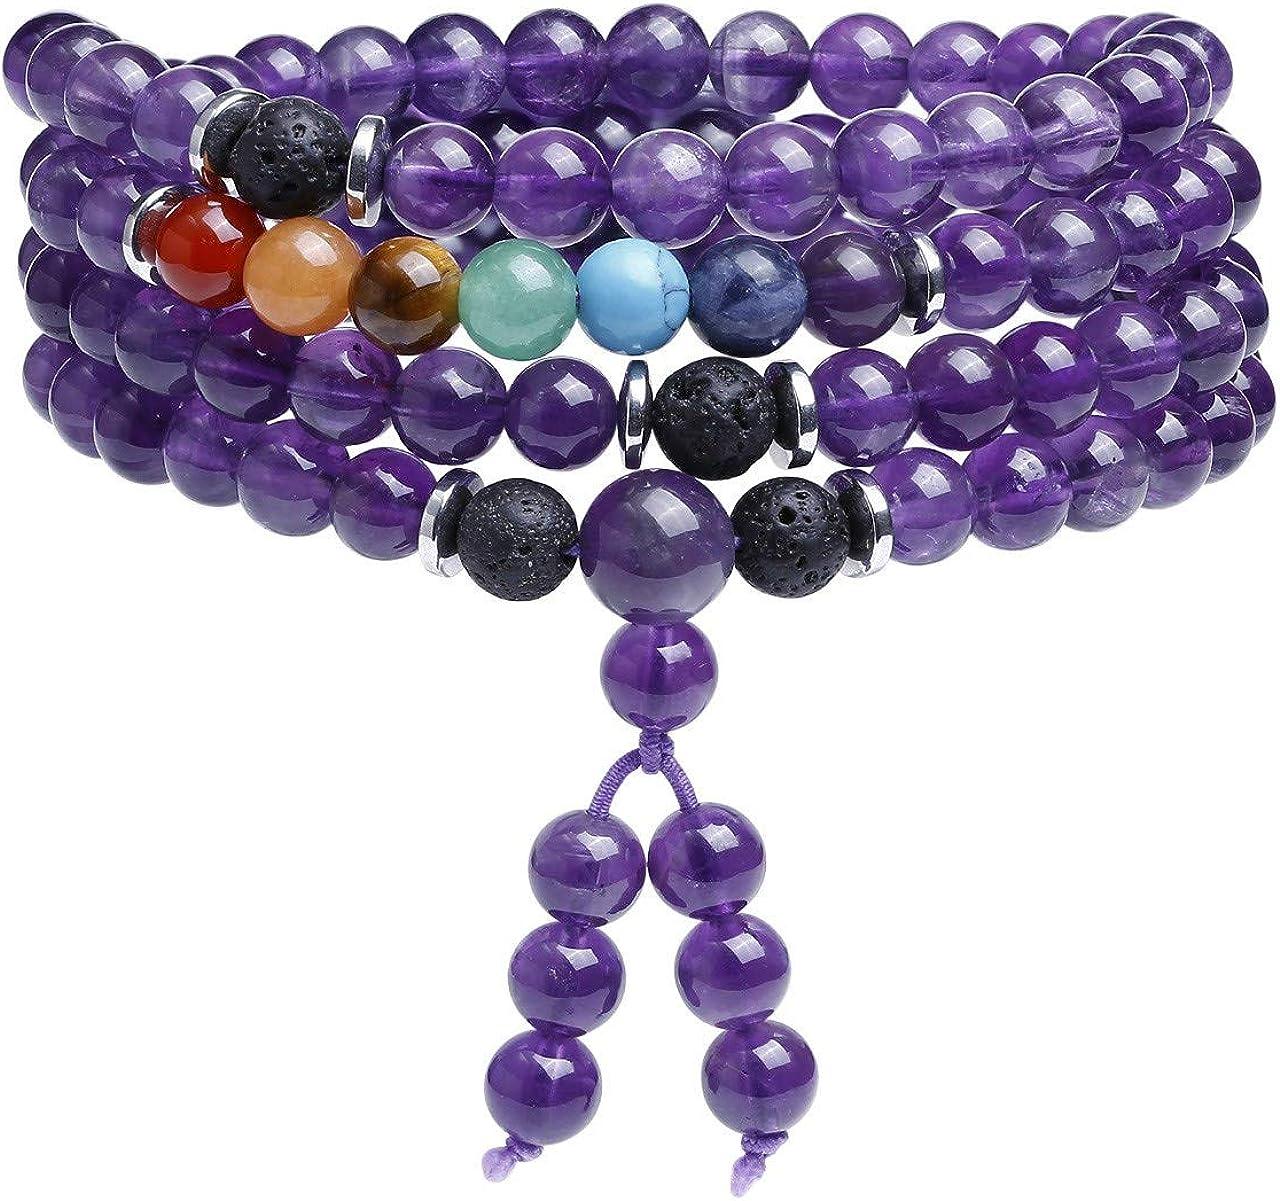 8mm Matte Agate Color Stone 108 Beads Handmade Mala Bracelet Chakra Prayer